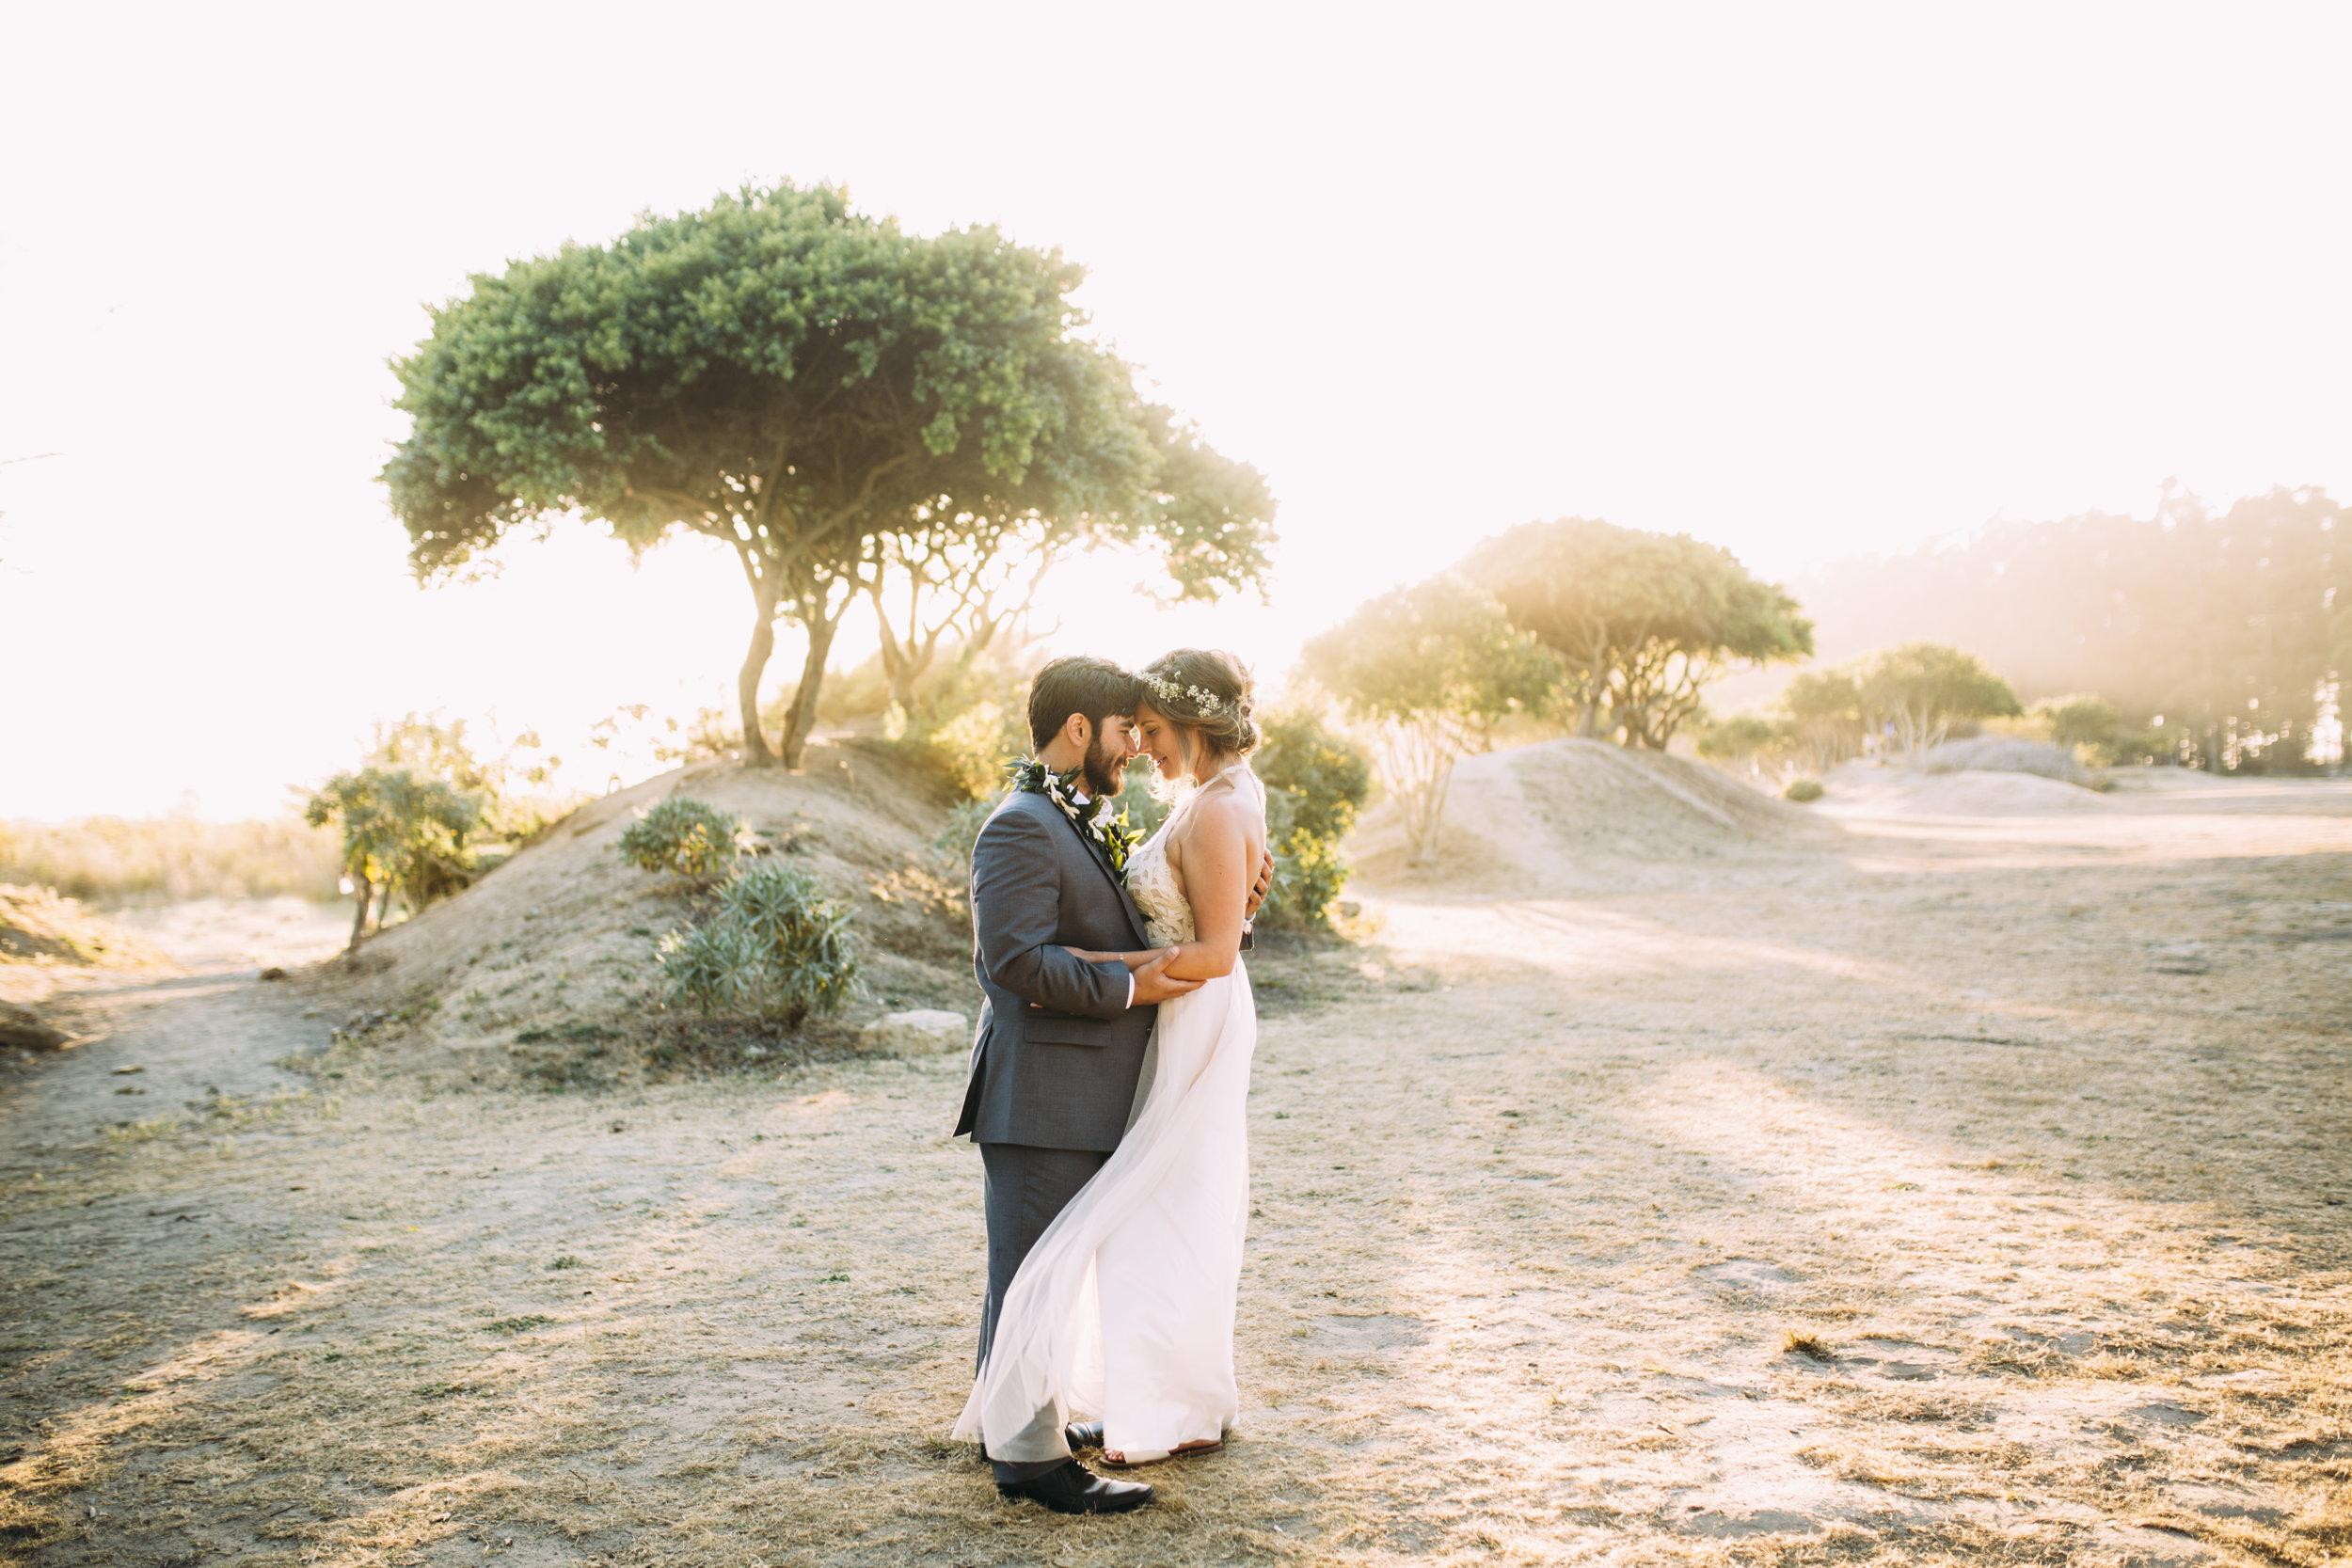 Nataly Zigdon Photography | San Francisco Wedding Photographer | Destination Wedding Photographer | Elopement Photographer | California Photographer